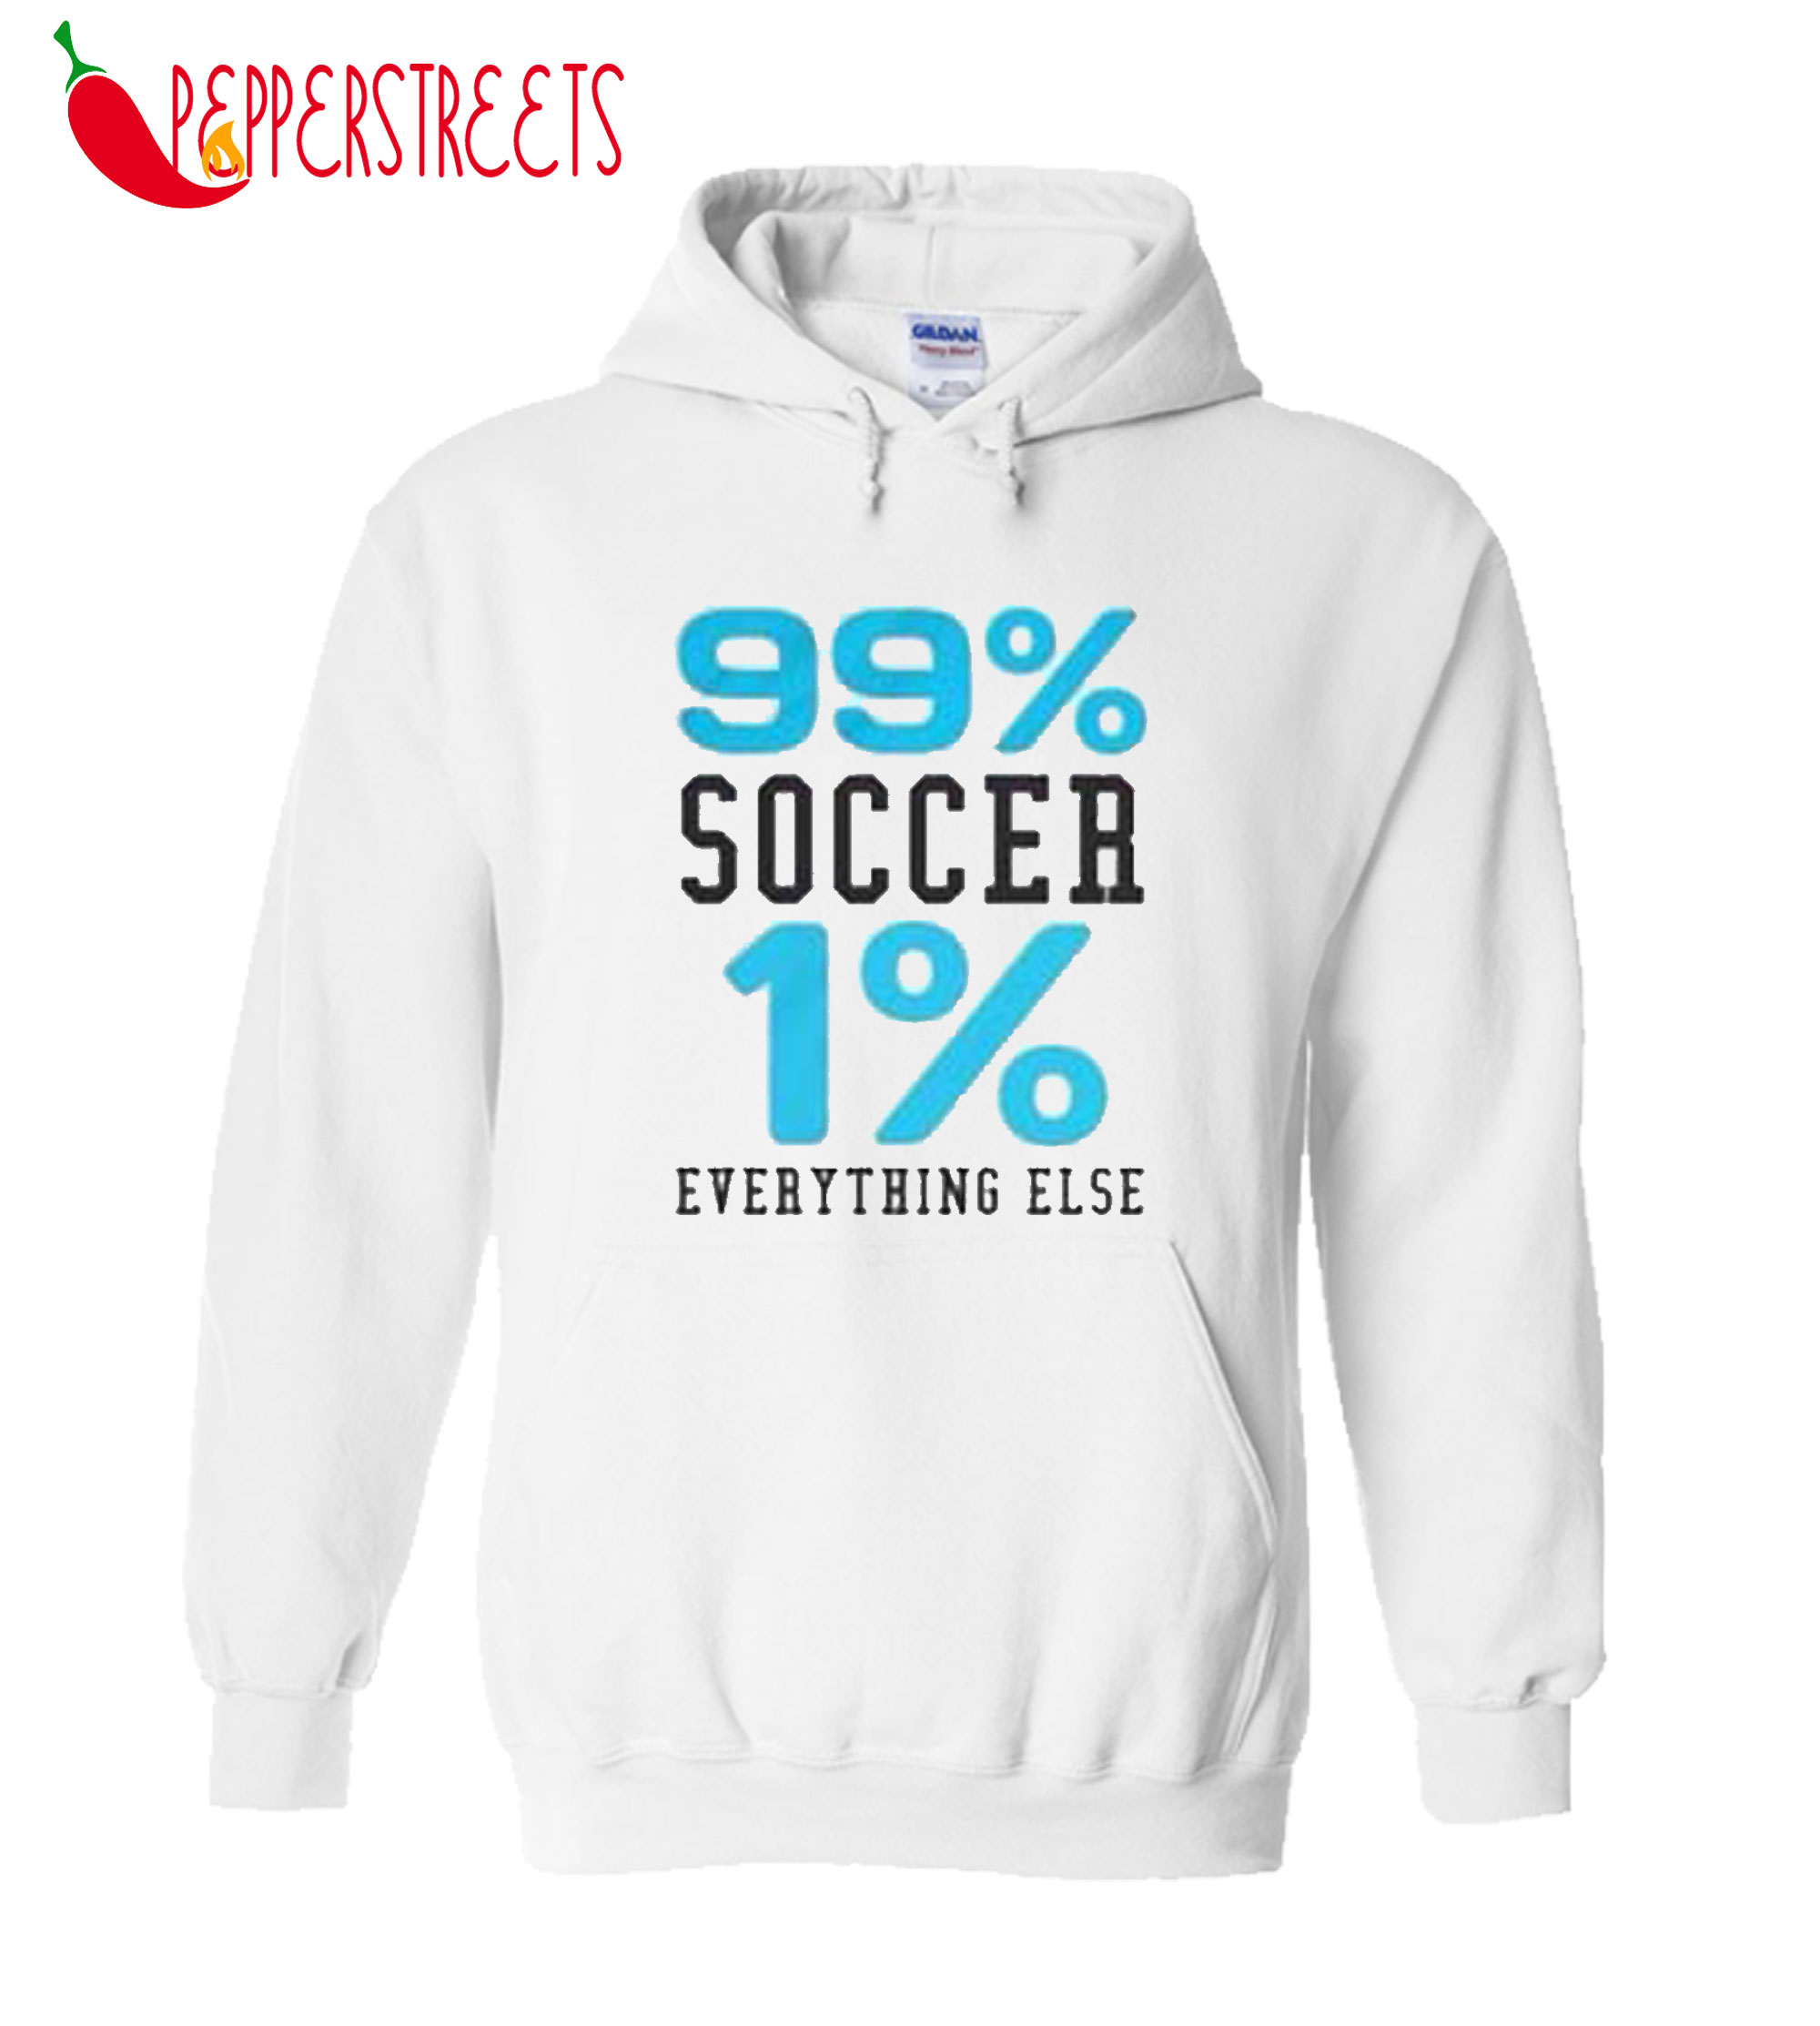 99% Soccer 1% Eveything Else Hoodie